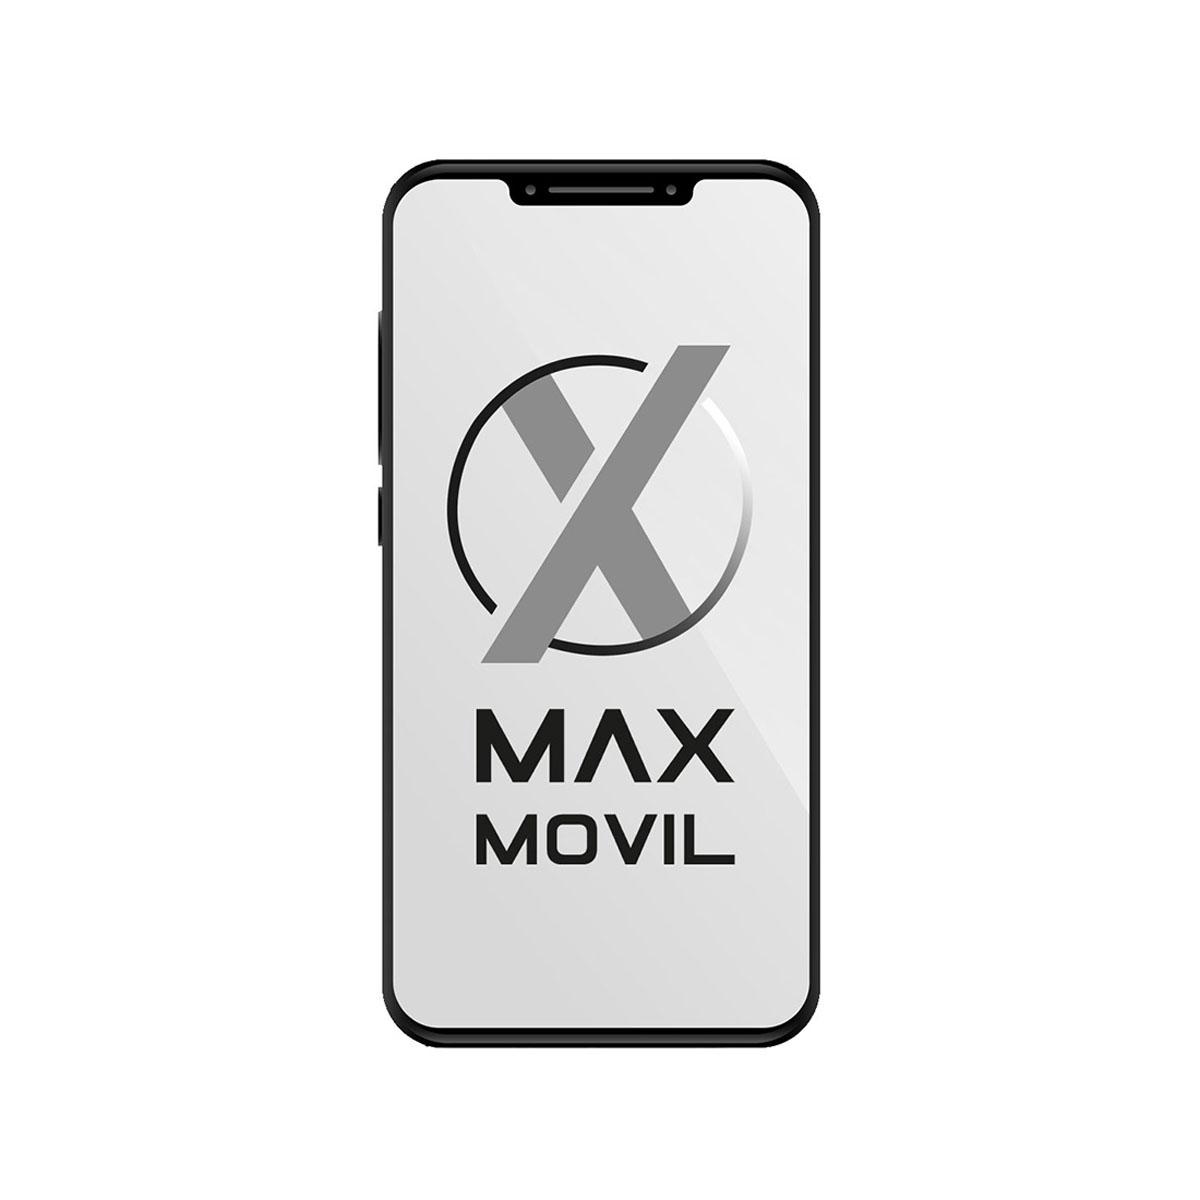 1627e7d13a1 Funda trasera tpu Iphone X transparente , silicona Comprar Online ...